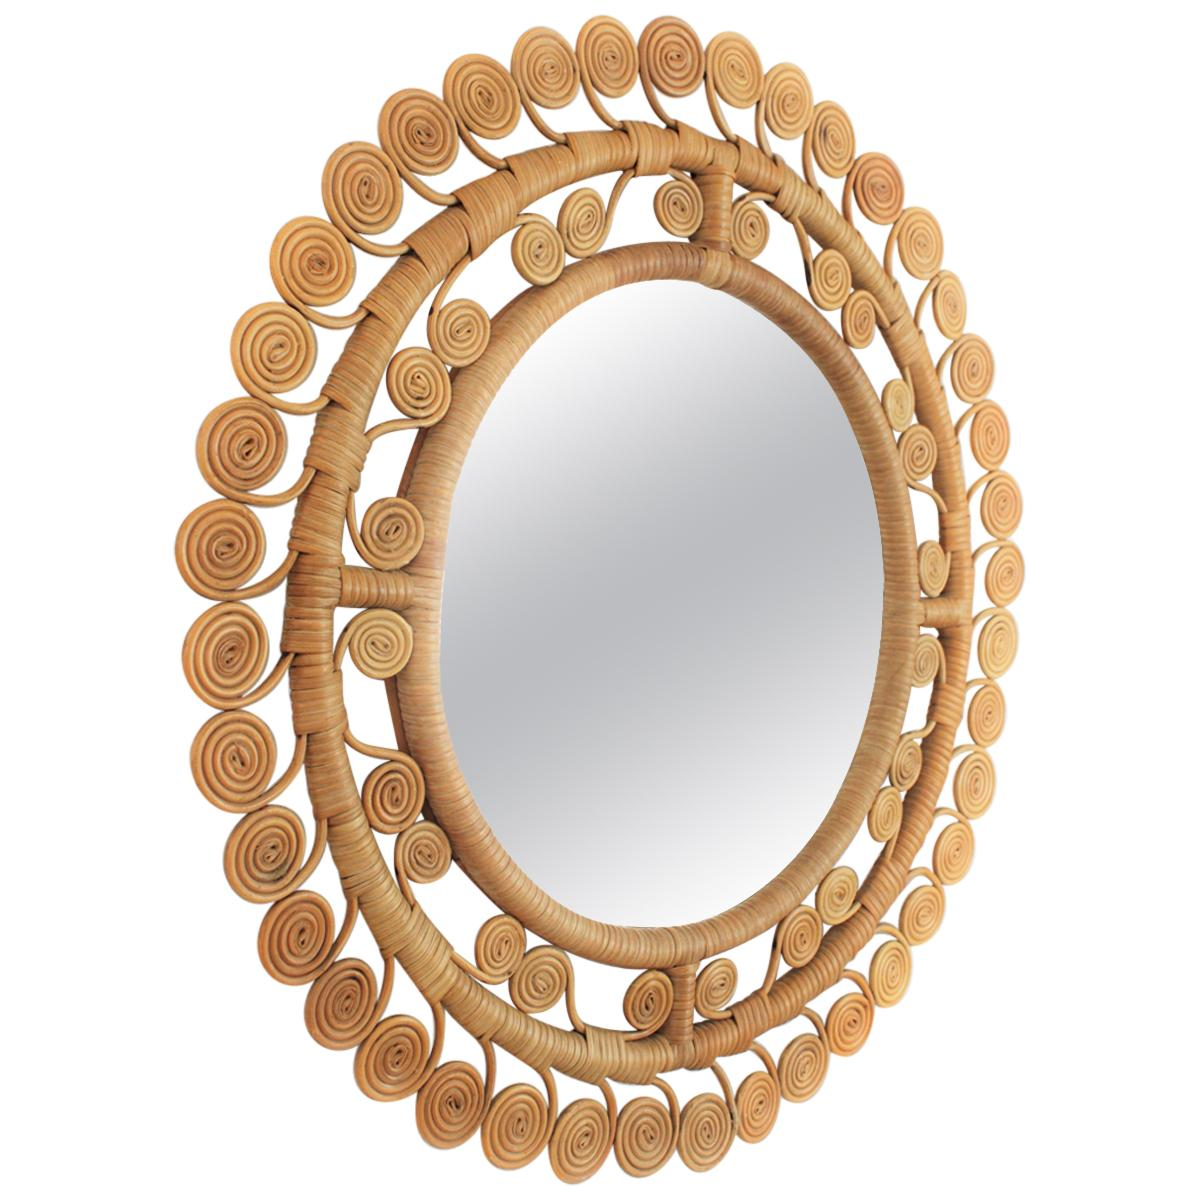 1960s Spanish Rattan Mirror with Filigree Scrollwork Frame